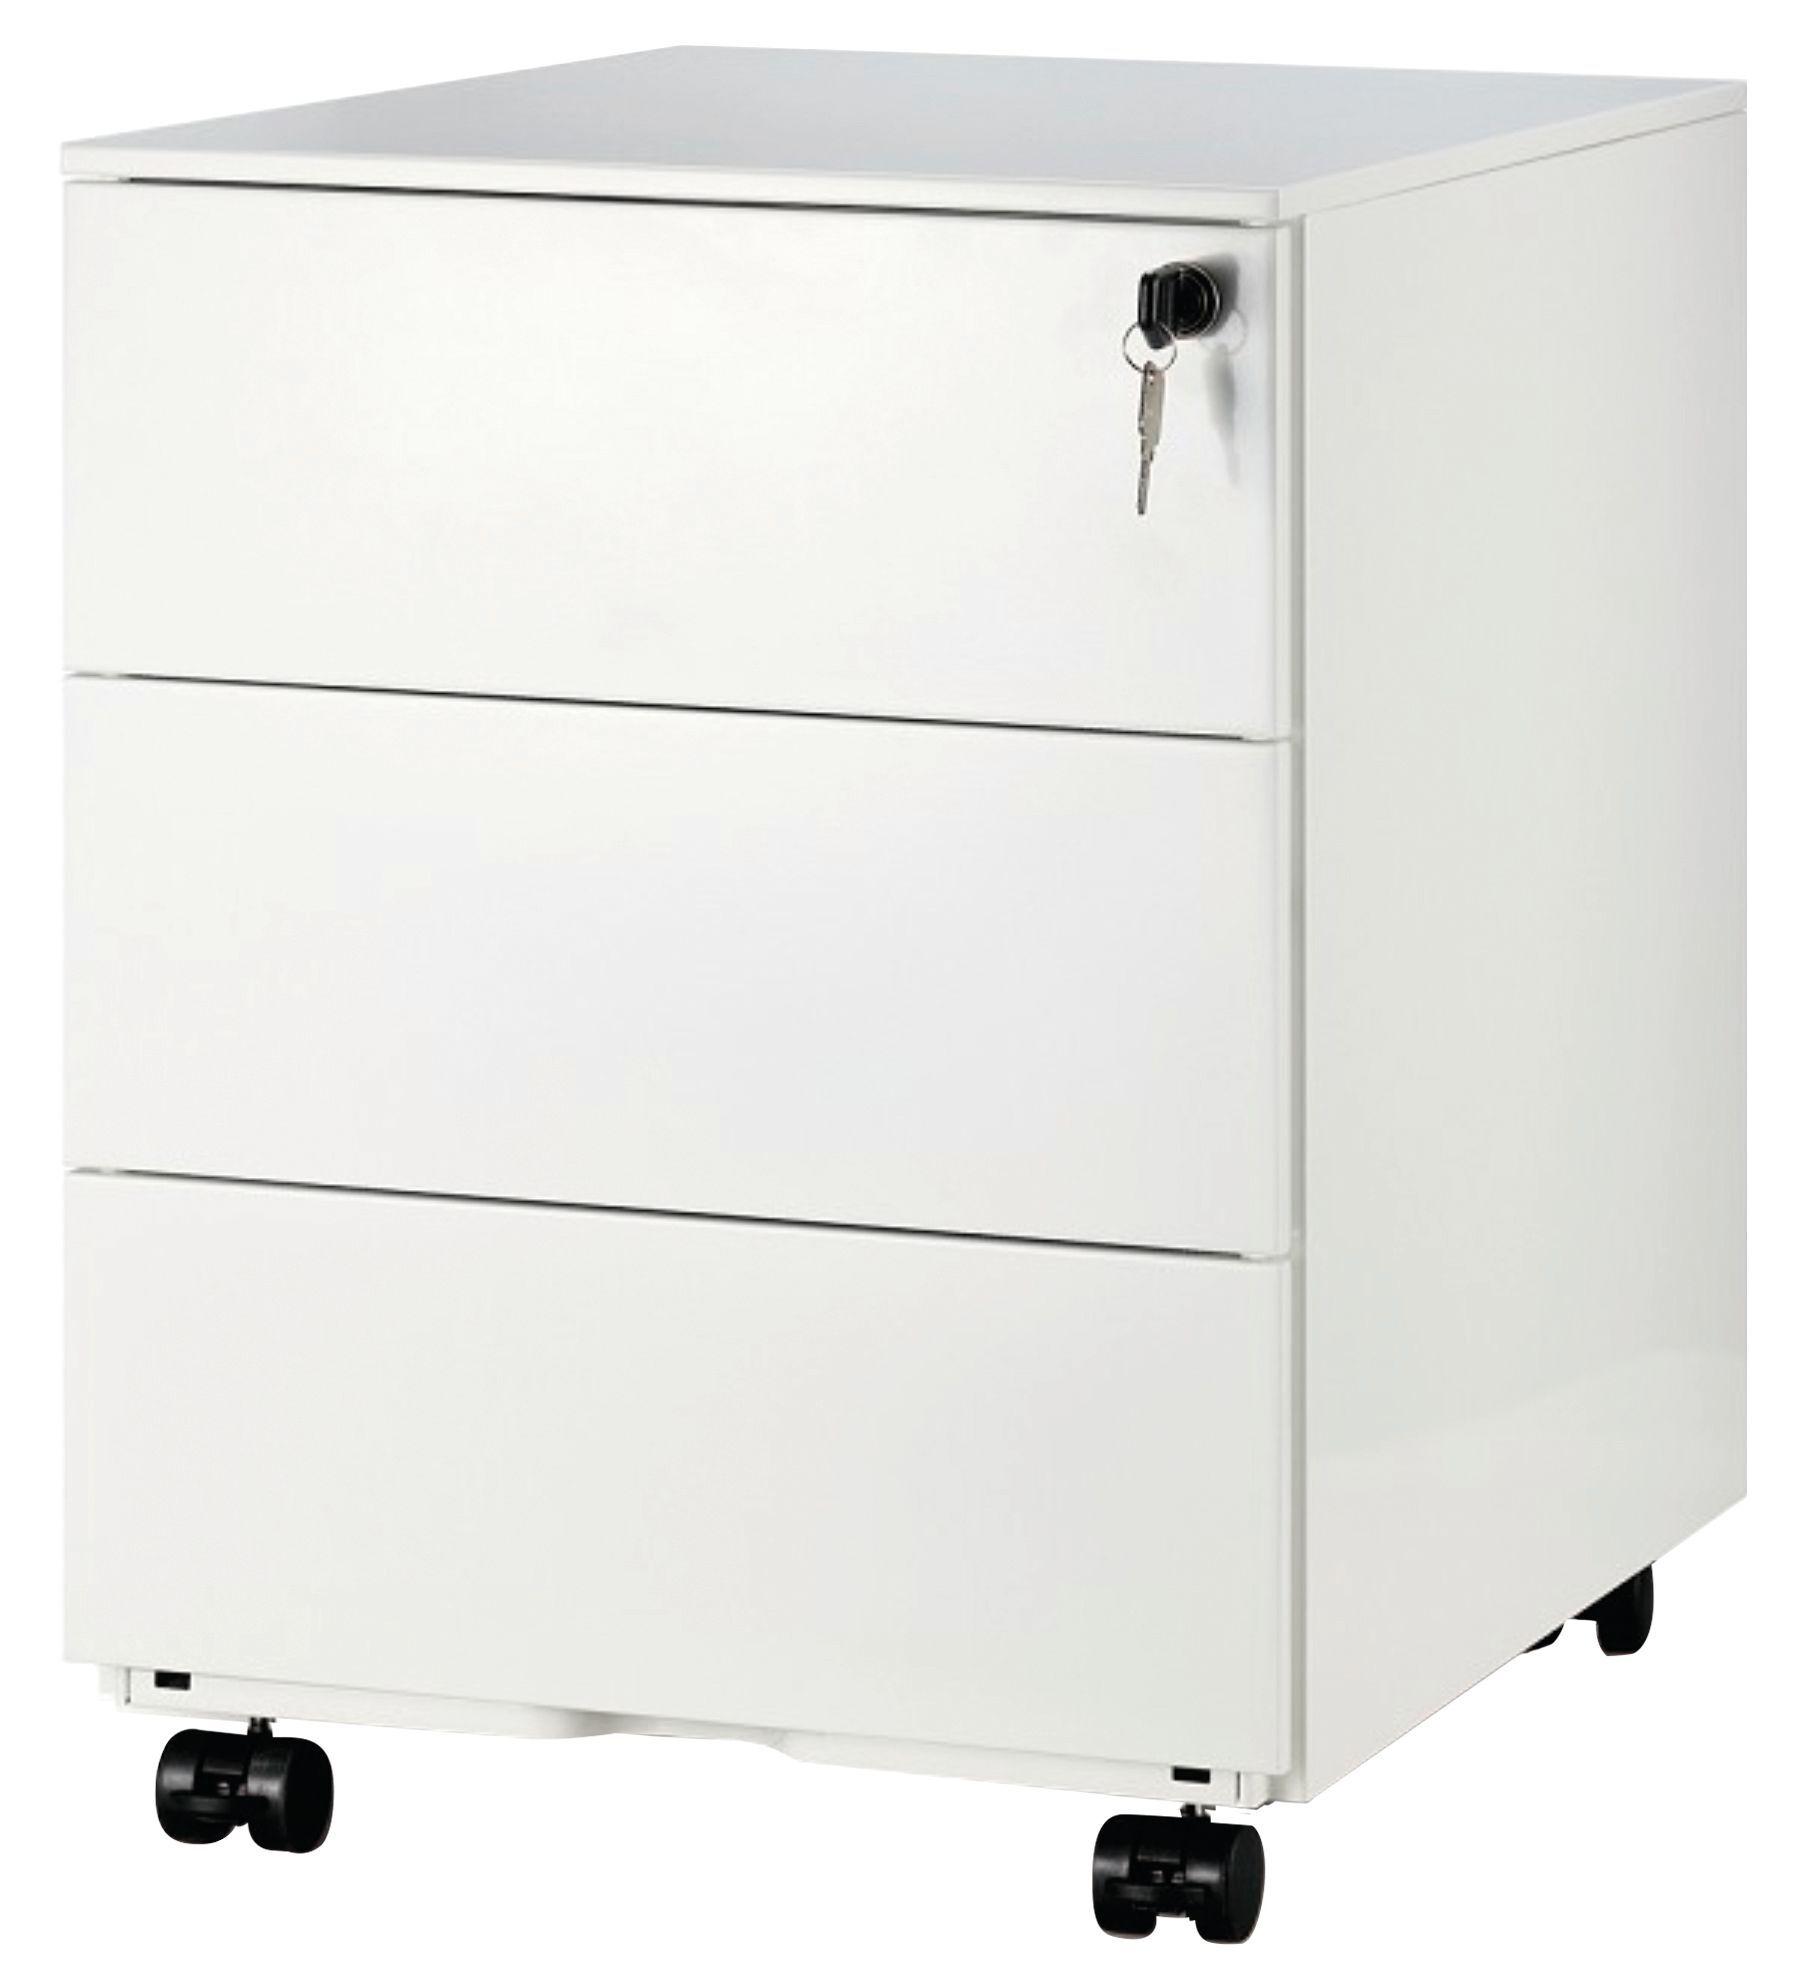 caisson mobile metallique monobloc h50 x l42 x p56 5 cm 3 tiroirs blanc